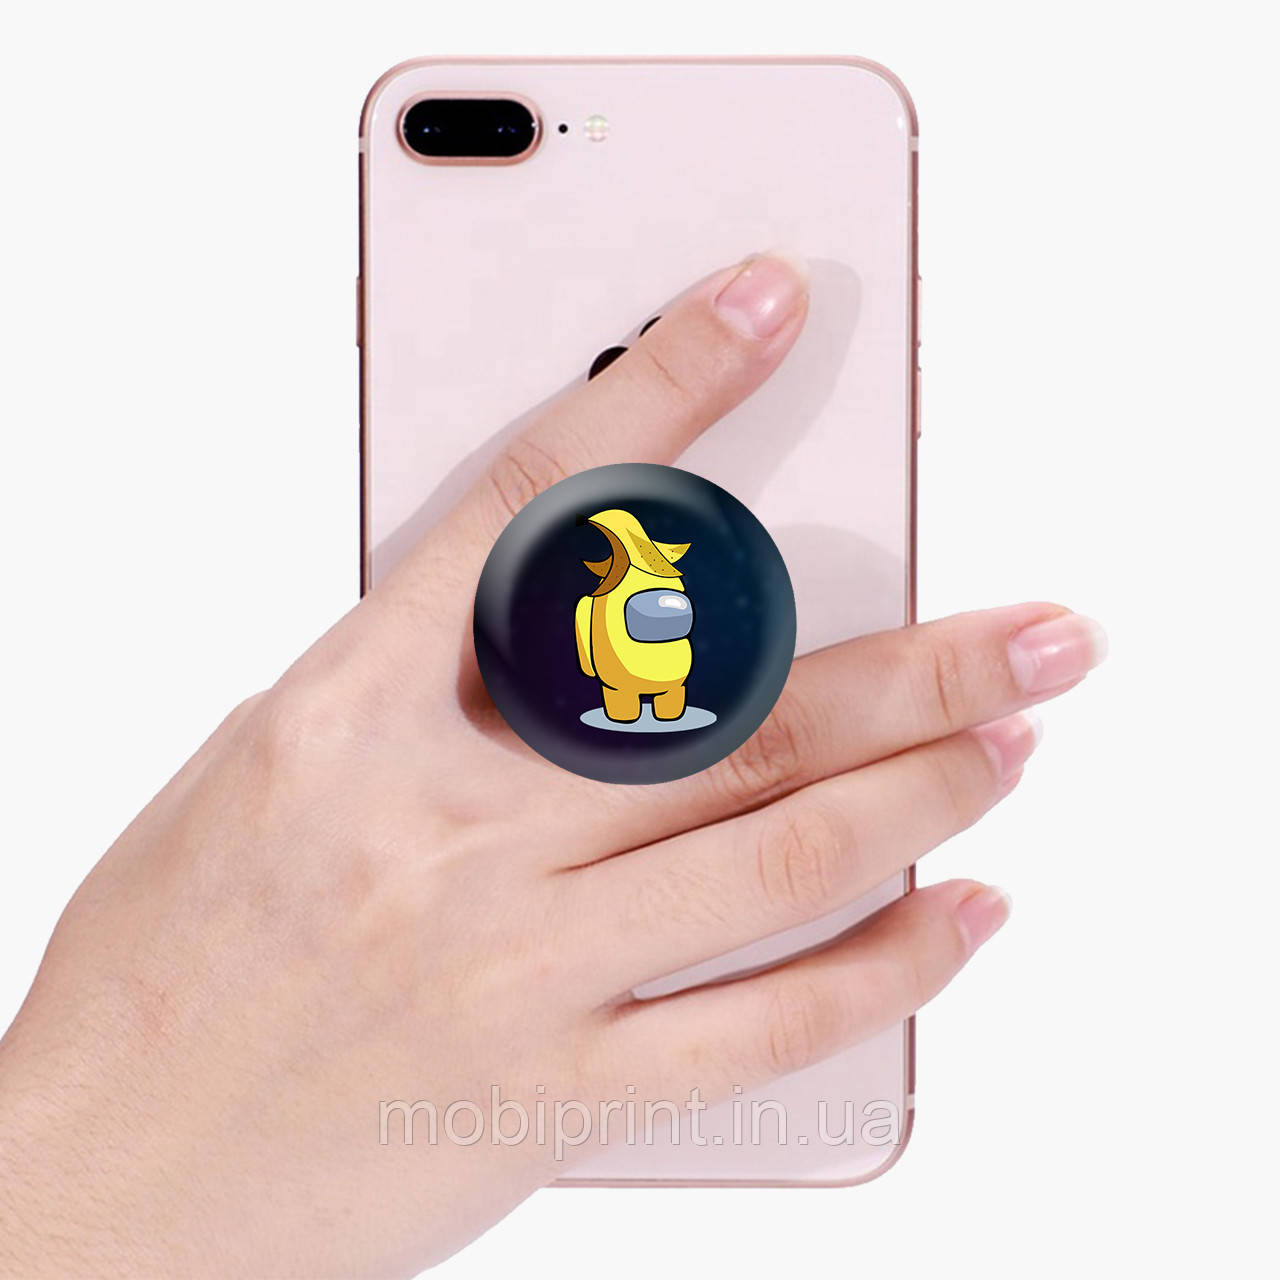 Попсокет (Popsockets) тримач для смартфона Амонг Ас Жовтий (Among Us Yellow) (8754-2416)